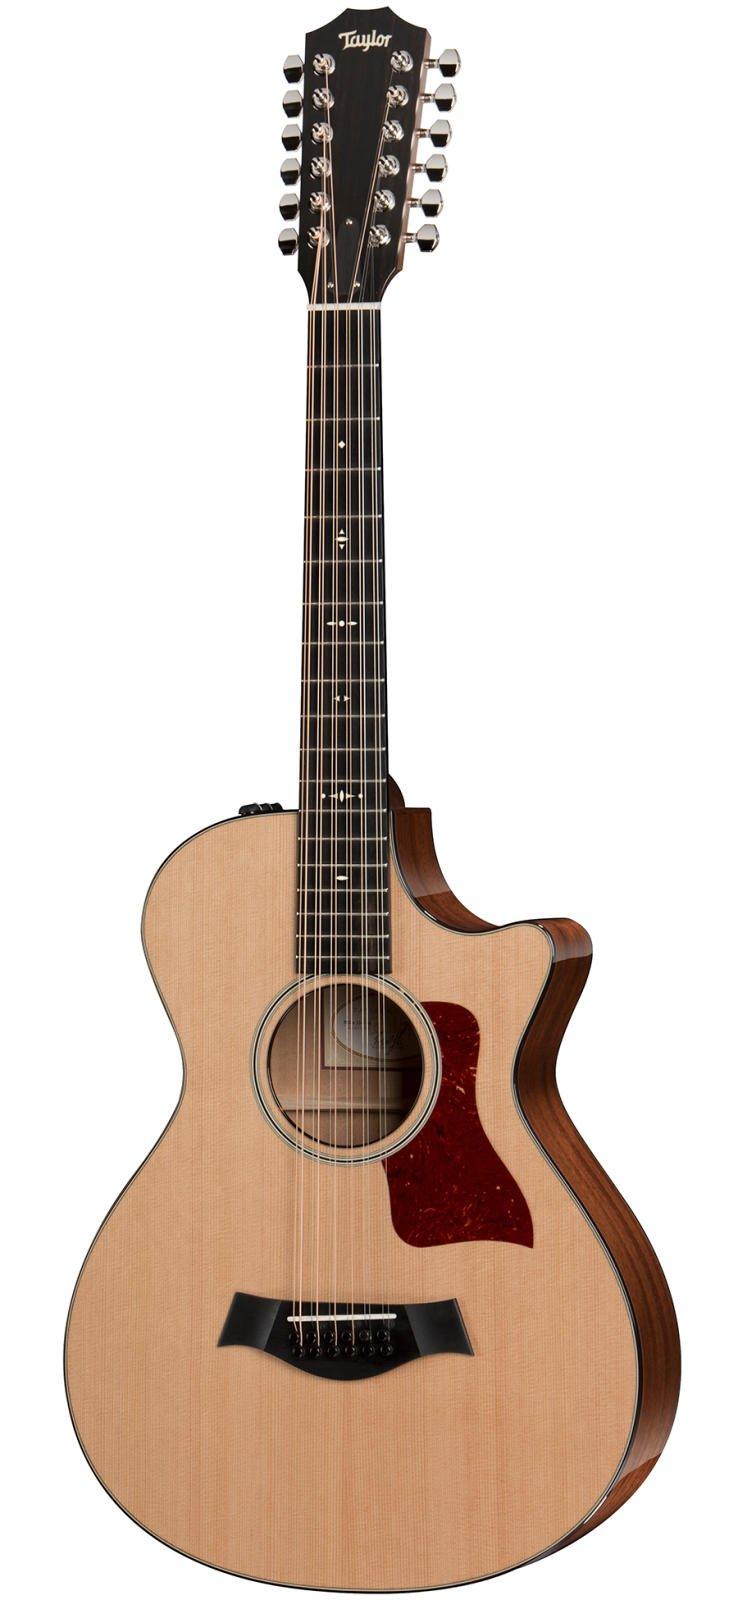 Taylor 552ce